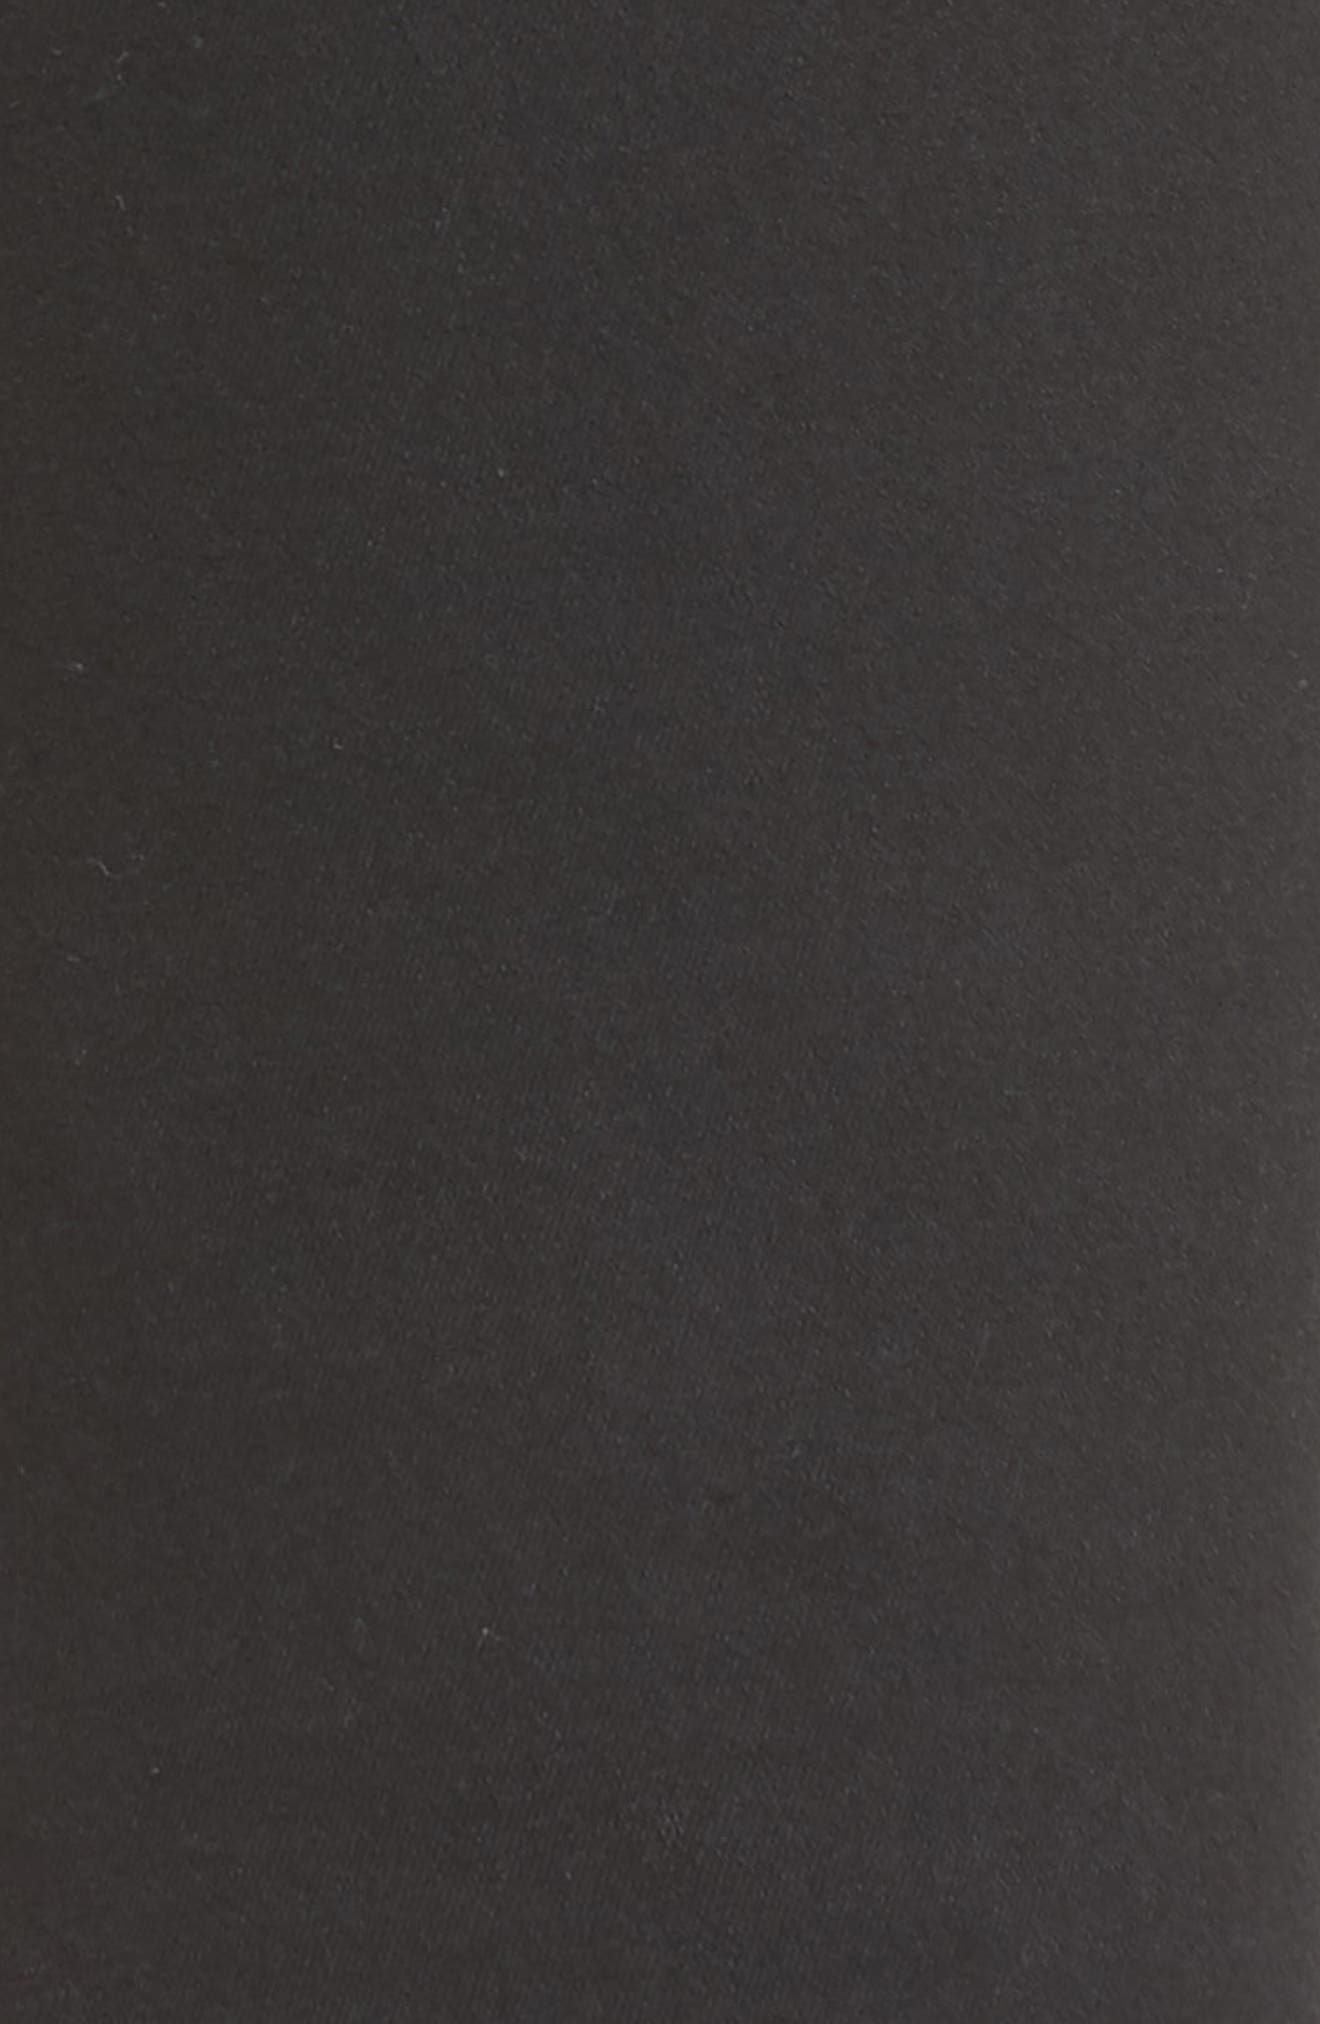 Leroy Slim Fit Jeans,                             Alternate thumbnail 5, color,                             Black Ripped Knees